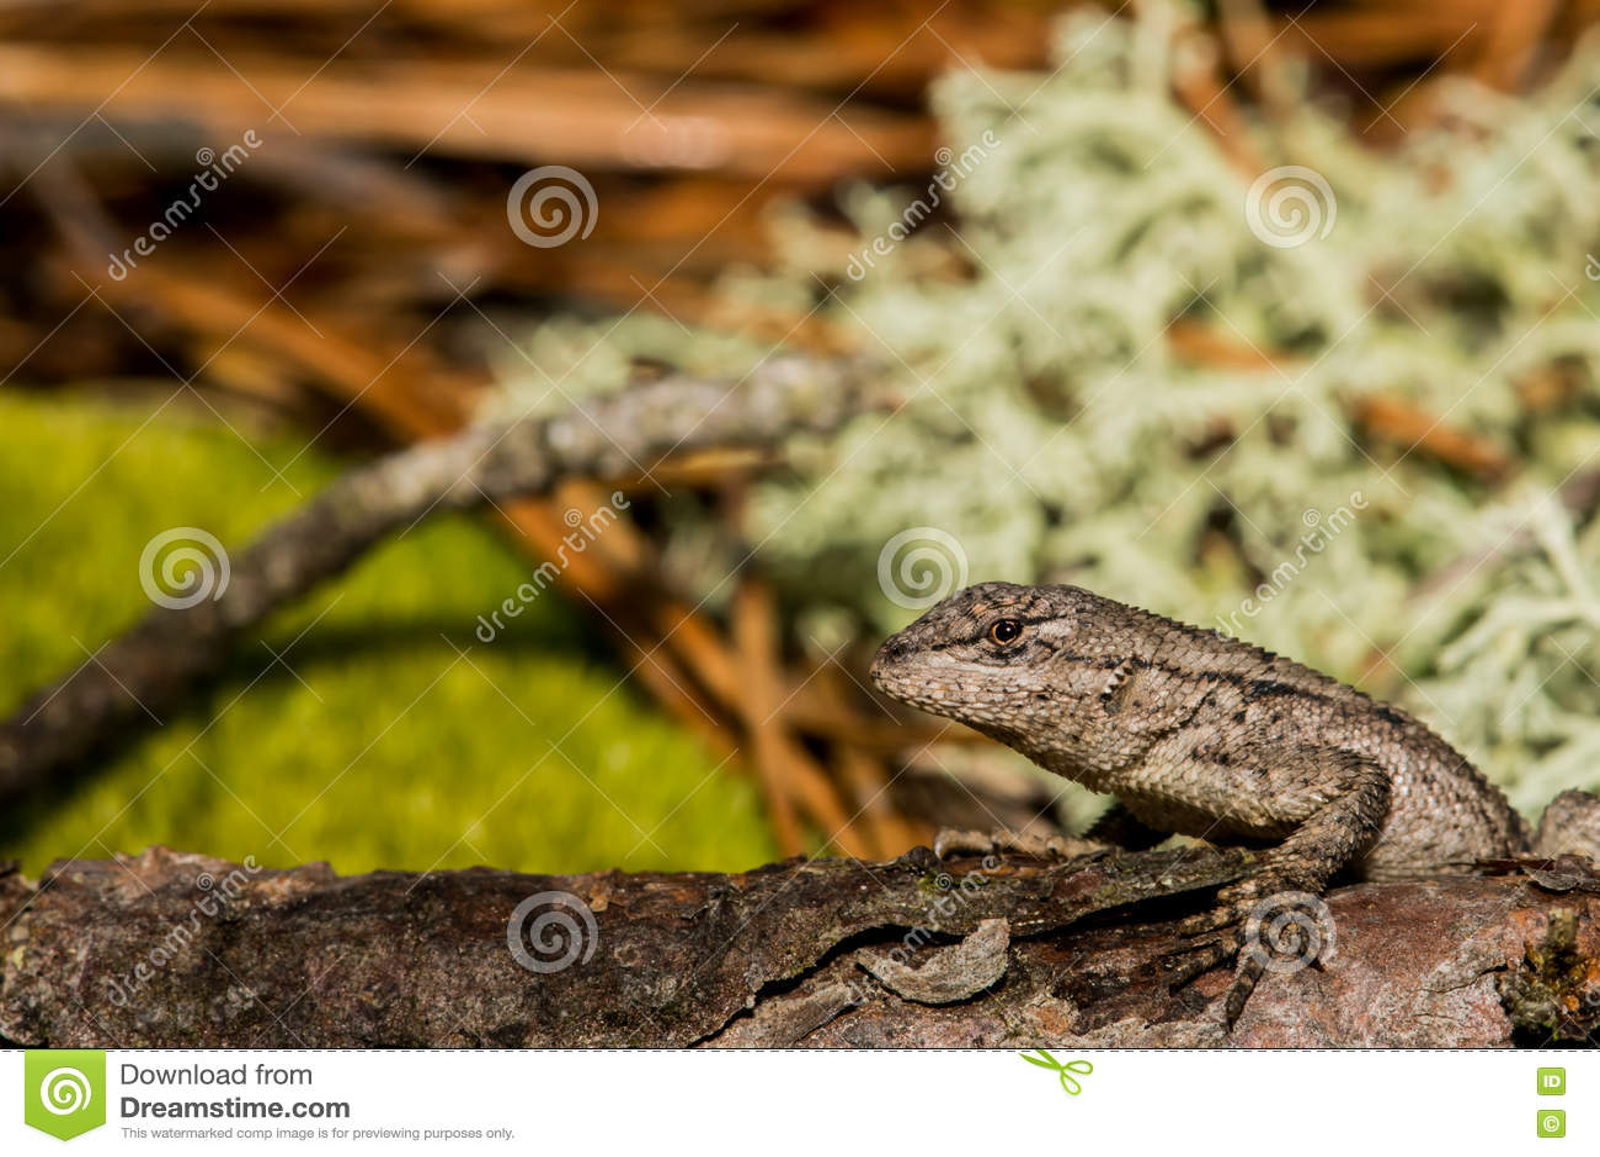 Eastern Fence Lizard Stock Photo Image Of Ecology Fauna 70679786